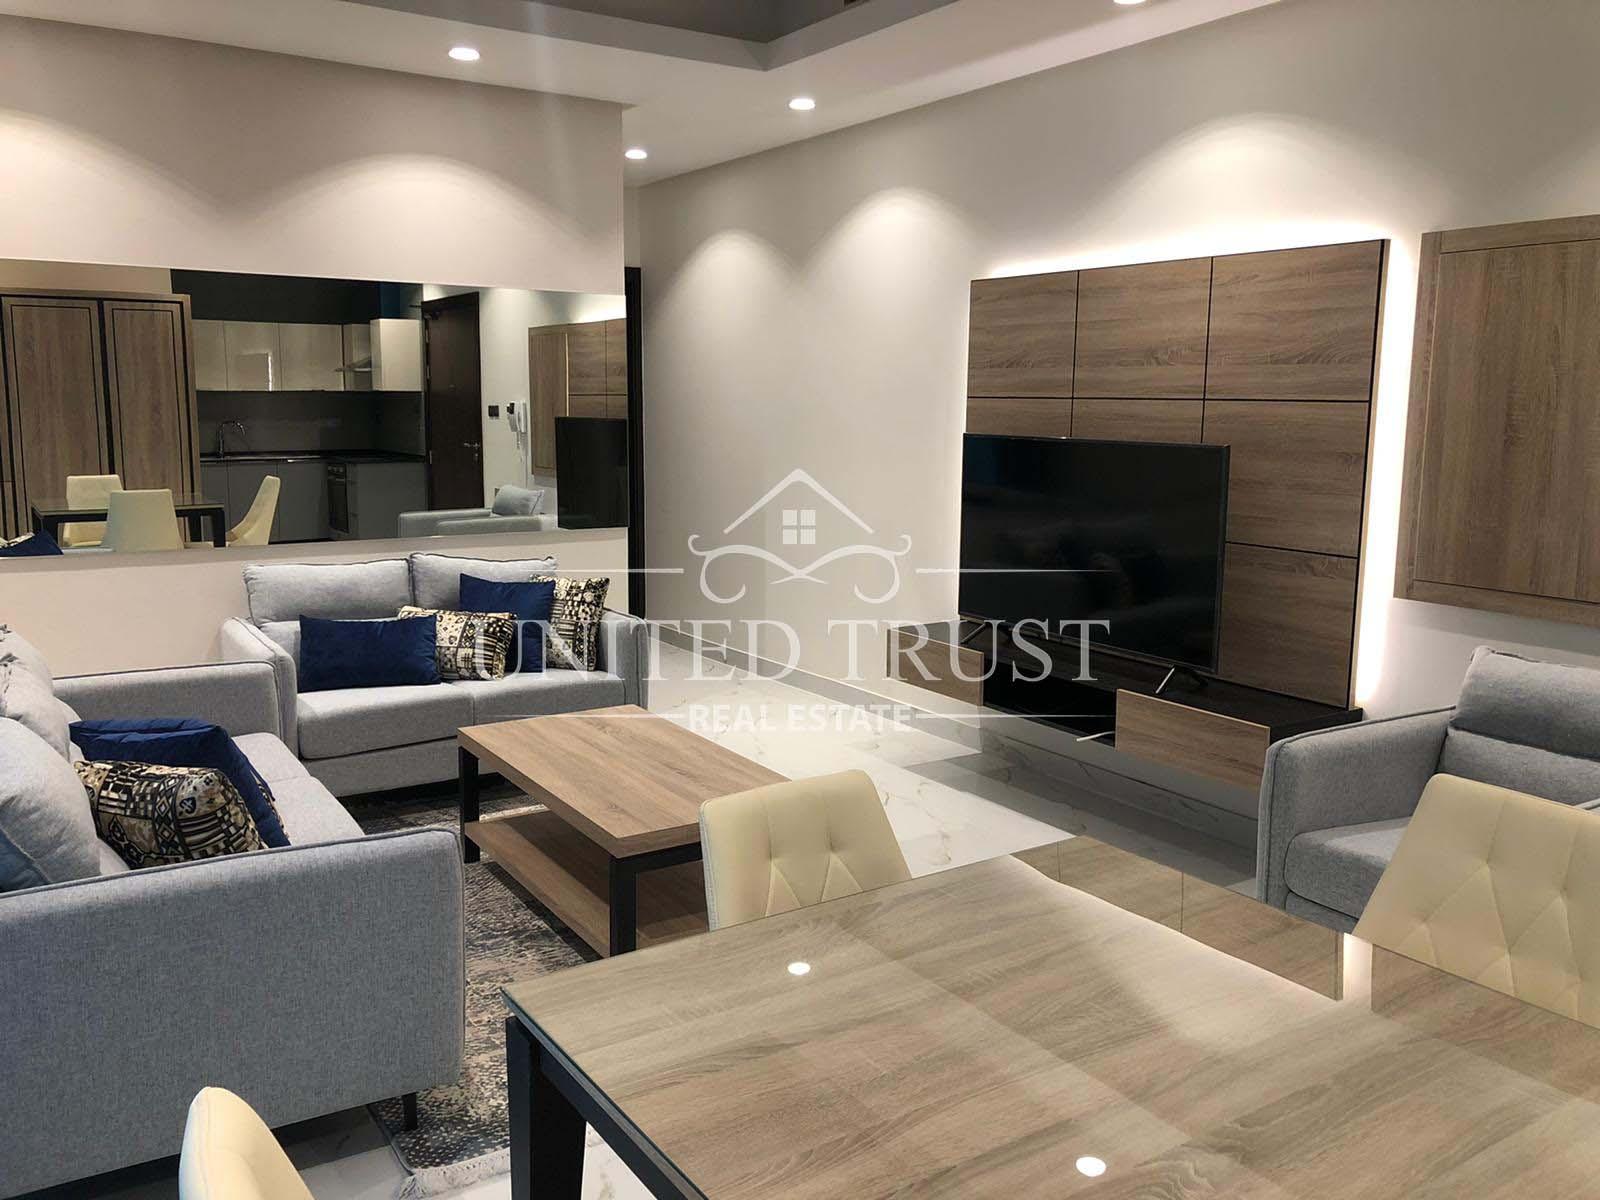 For Rent Apartment In Juffair Ref: JUF-SB-081